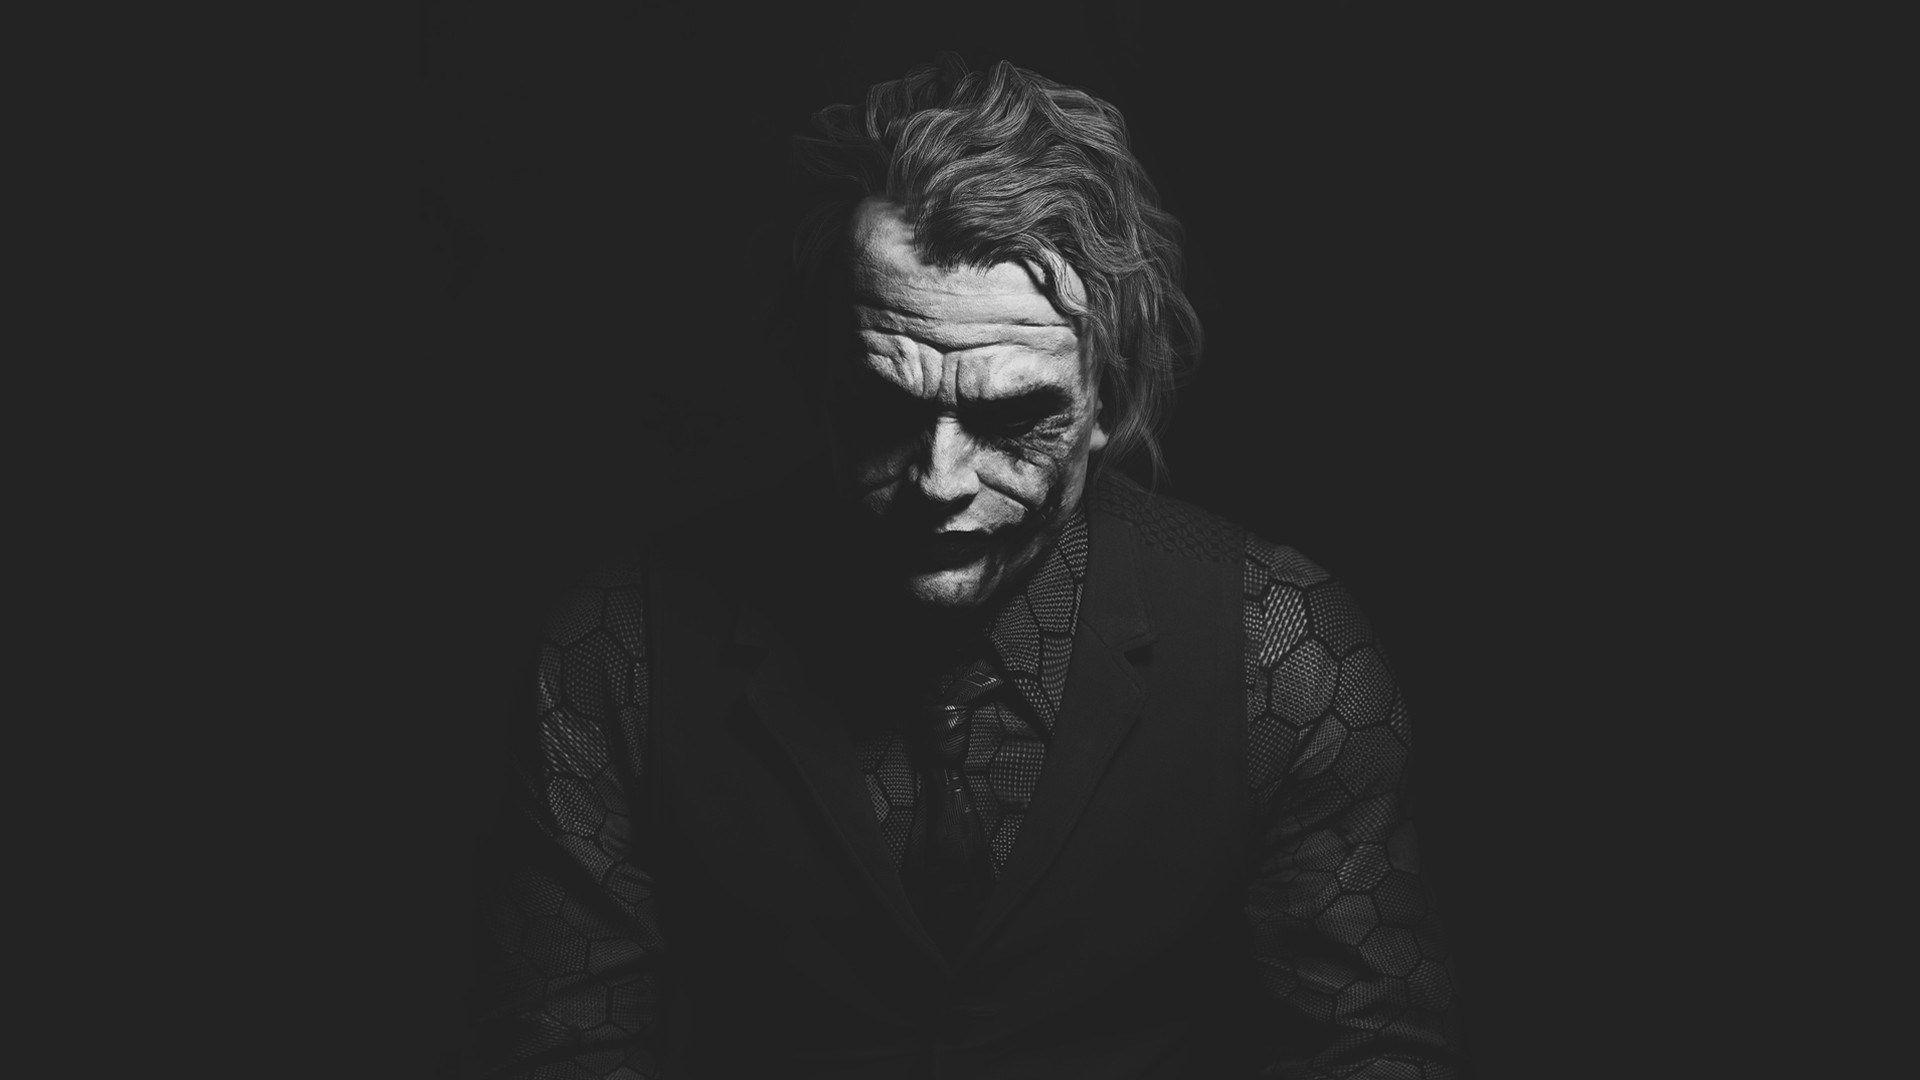 1920x1080 Joker Pic Desktop Joker Wallpapers Joker Background Joker Hd Wallpaper